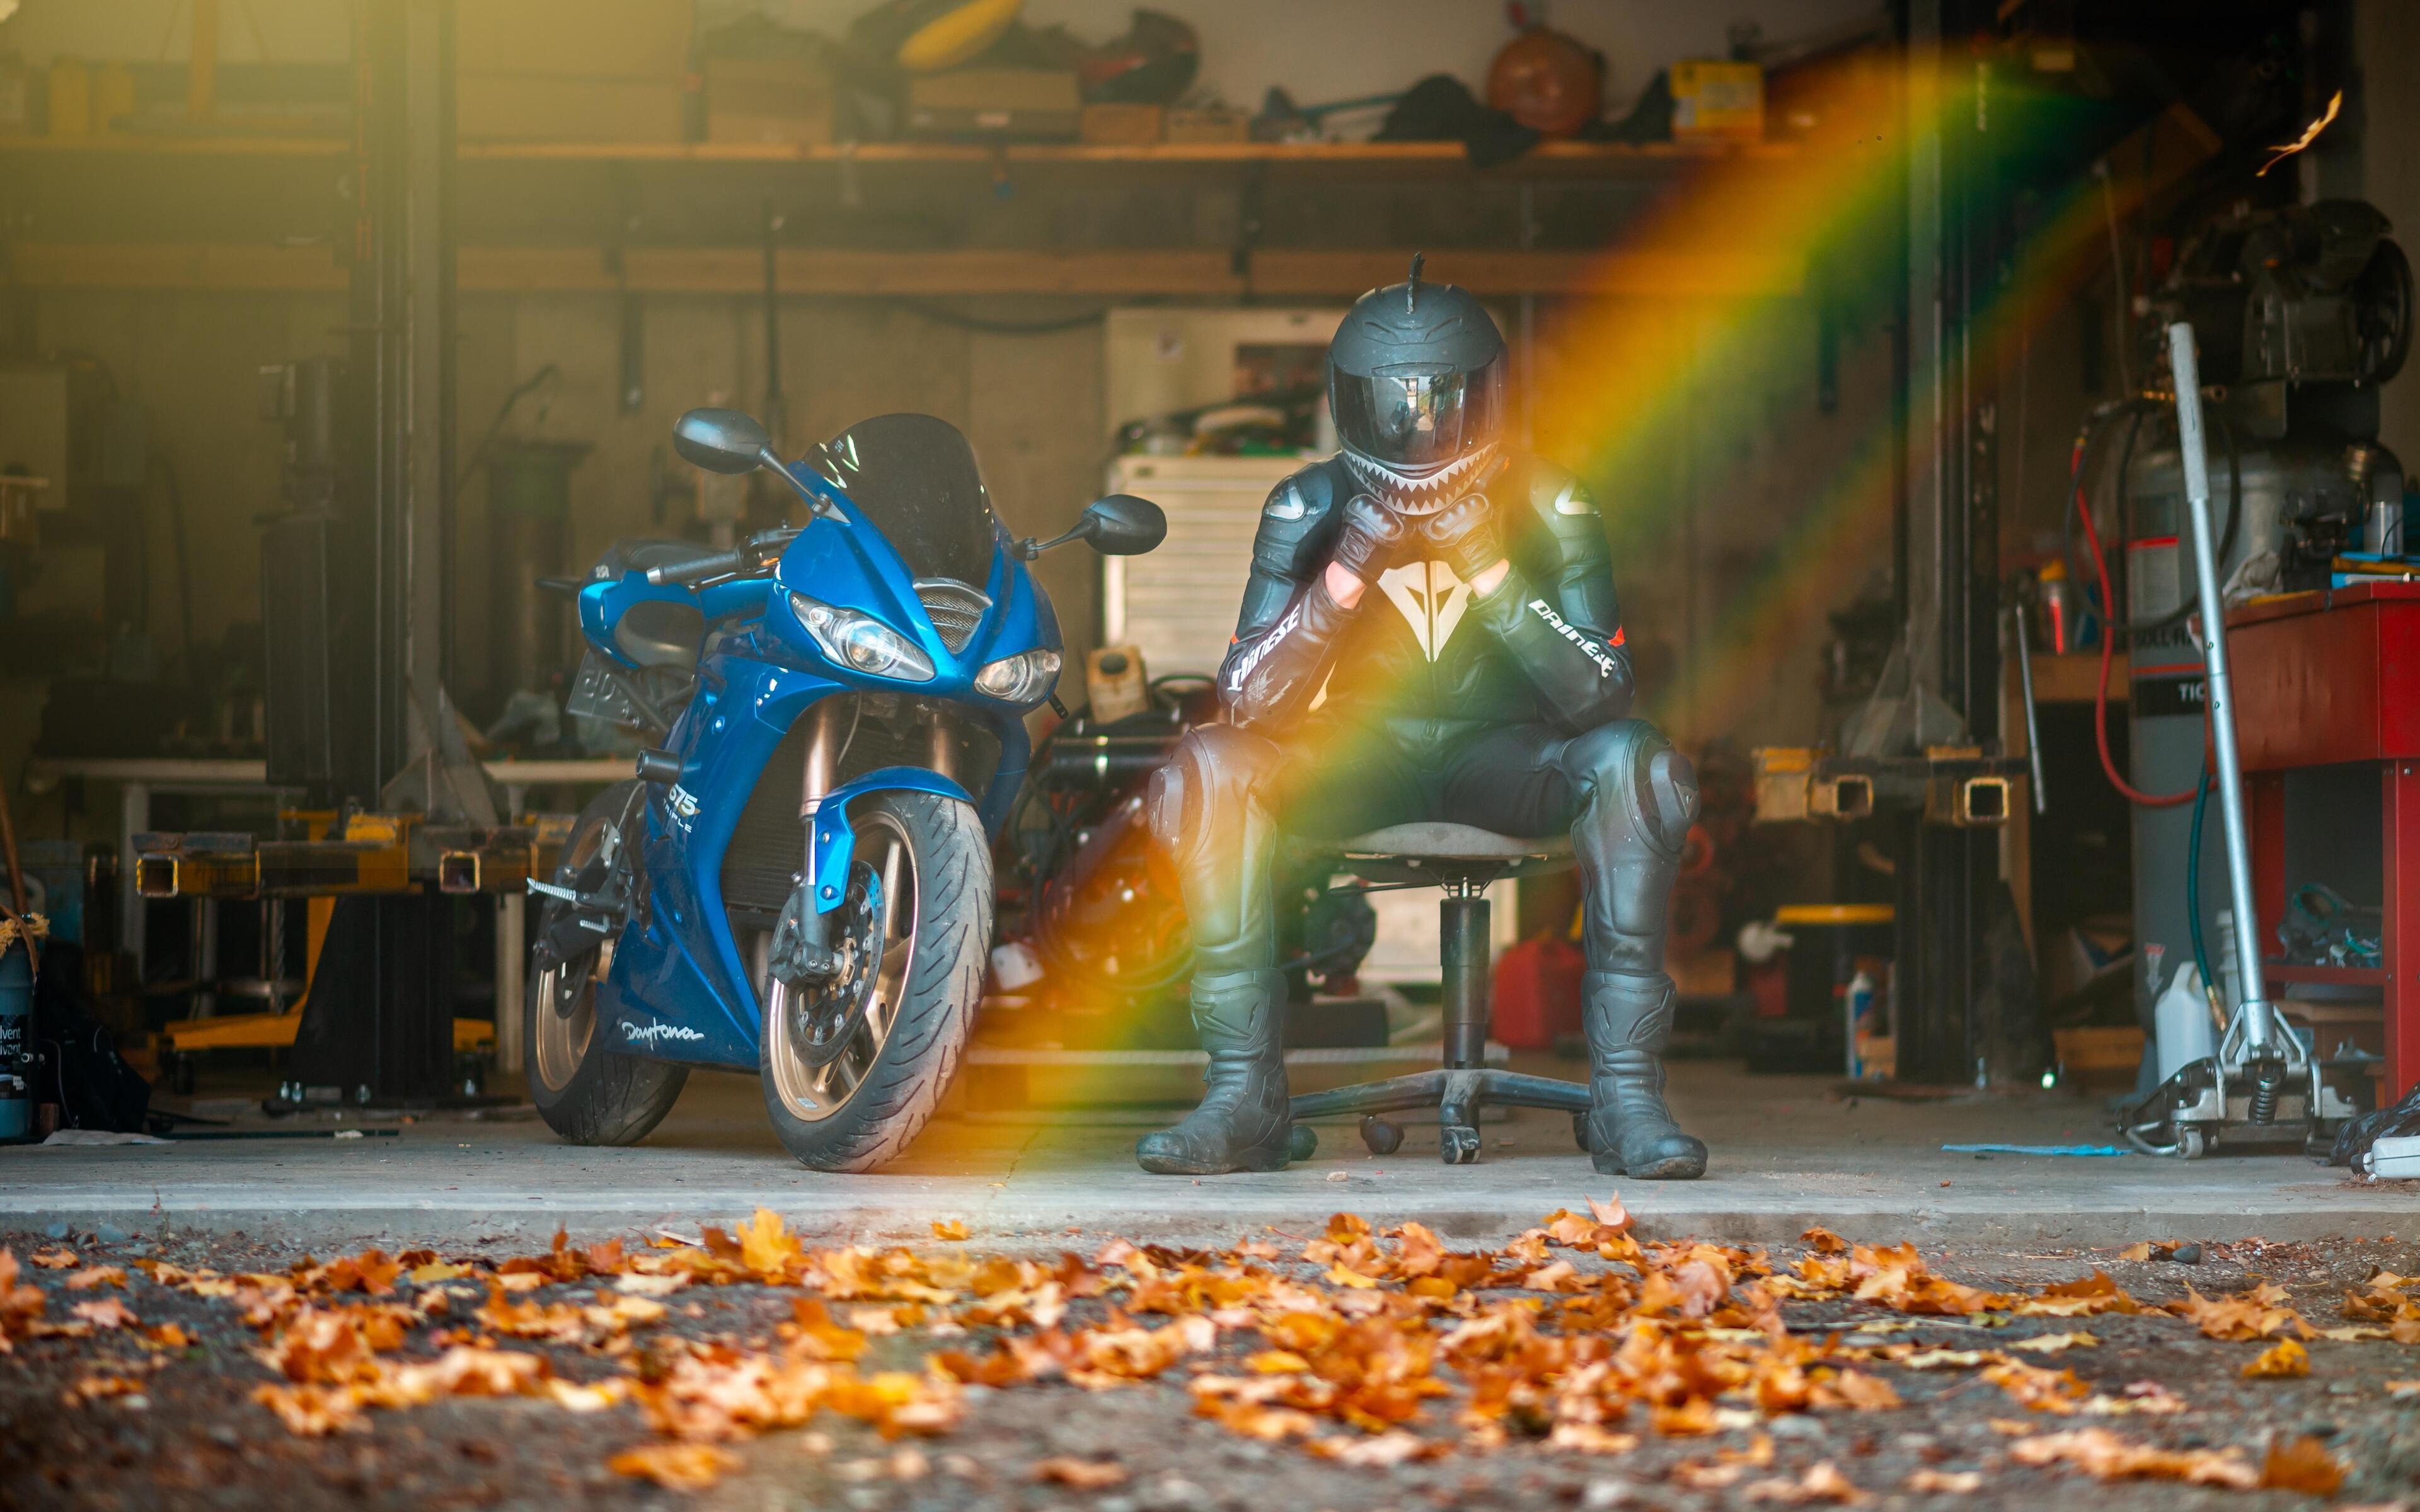 rider-with-daytona-675-triple-sitting-on-chair-or.jpg